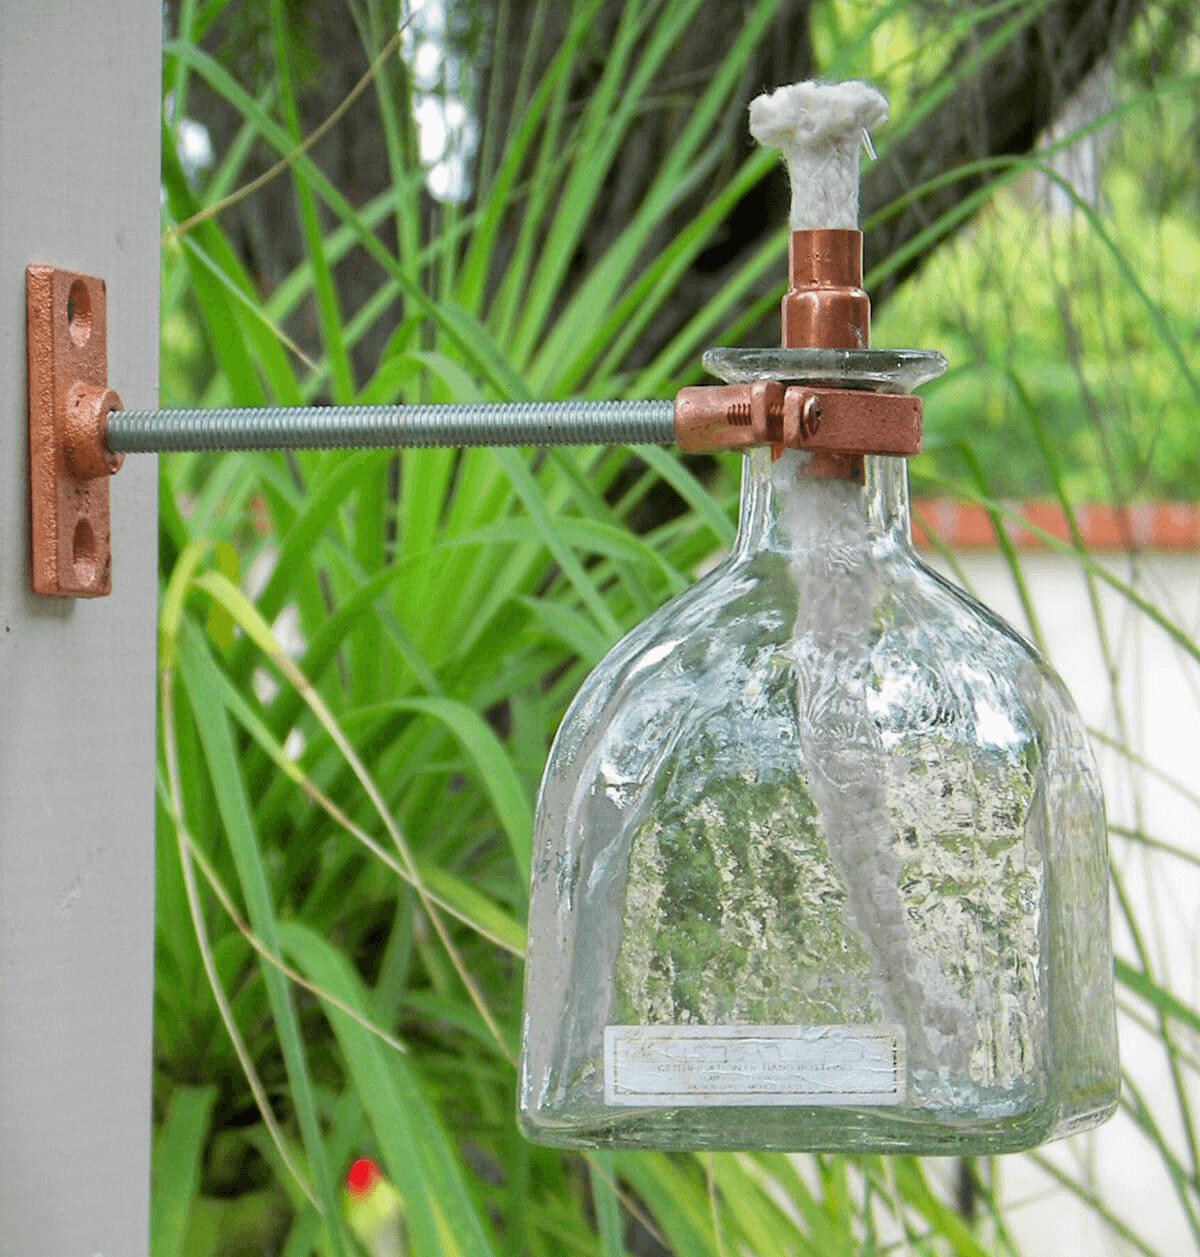 GLASS LANTERN PORCH LIGHTING IDEAS